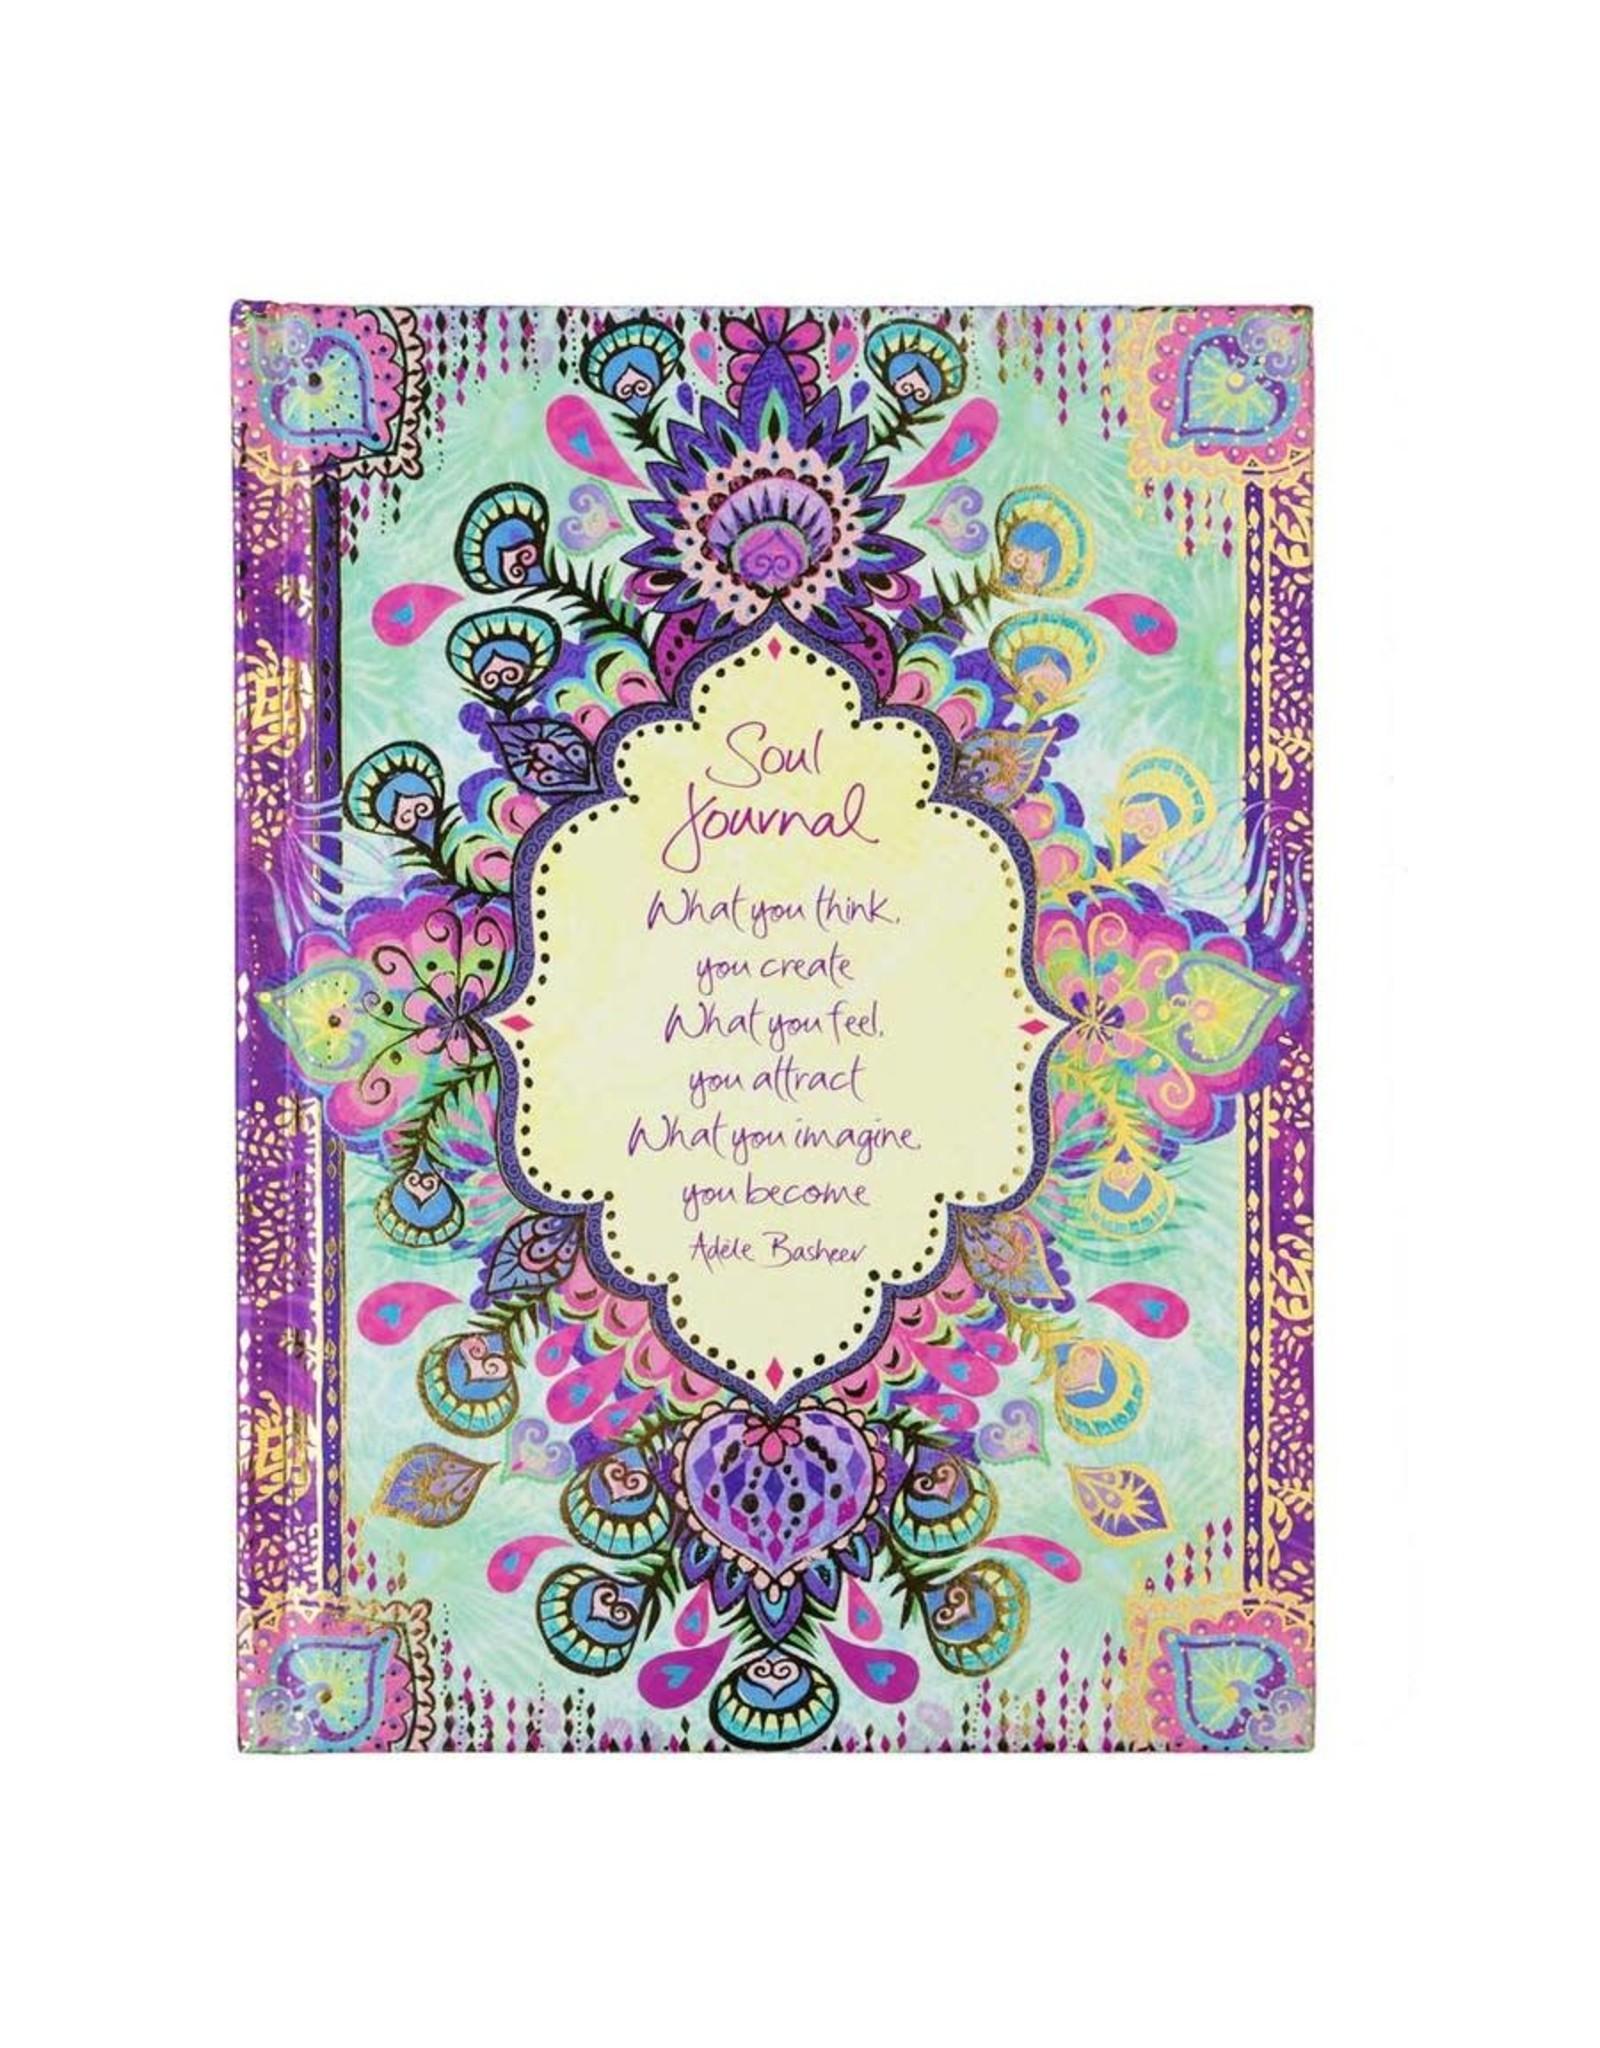 Intrinsic Soul Journal